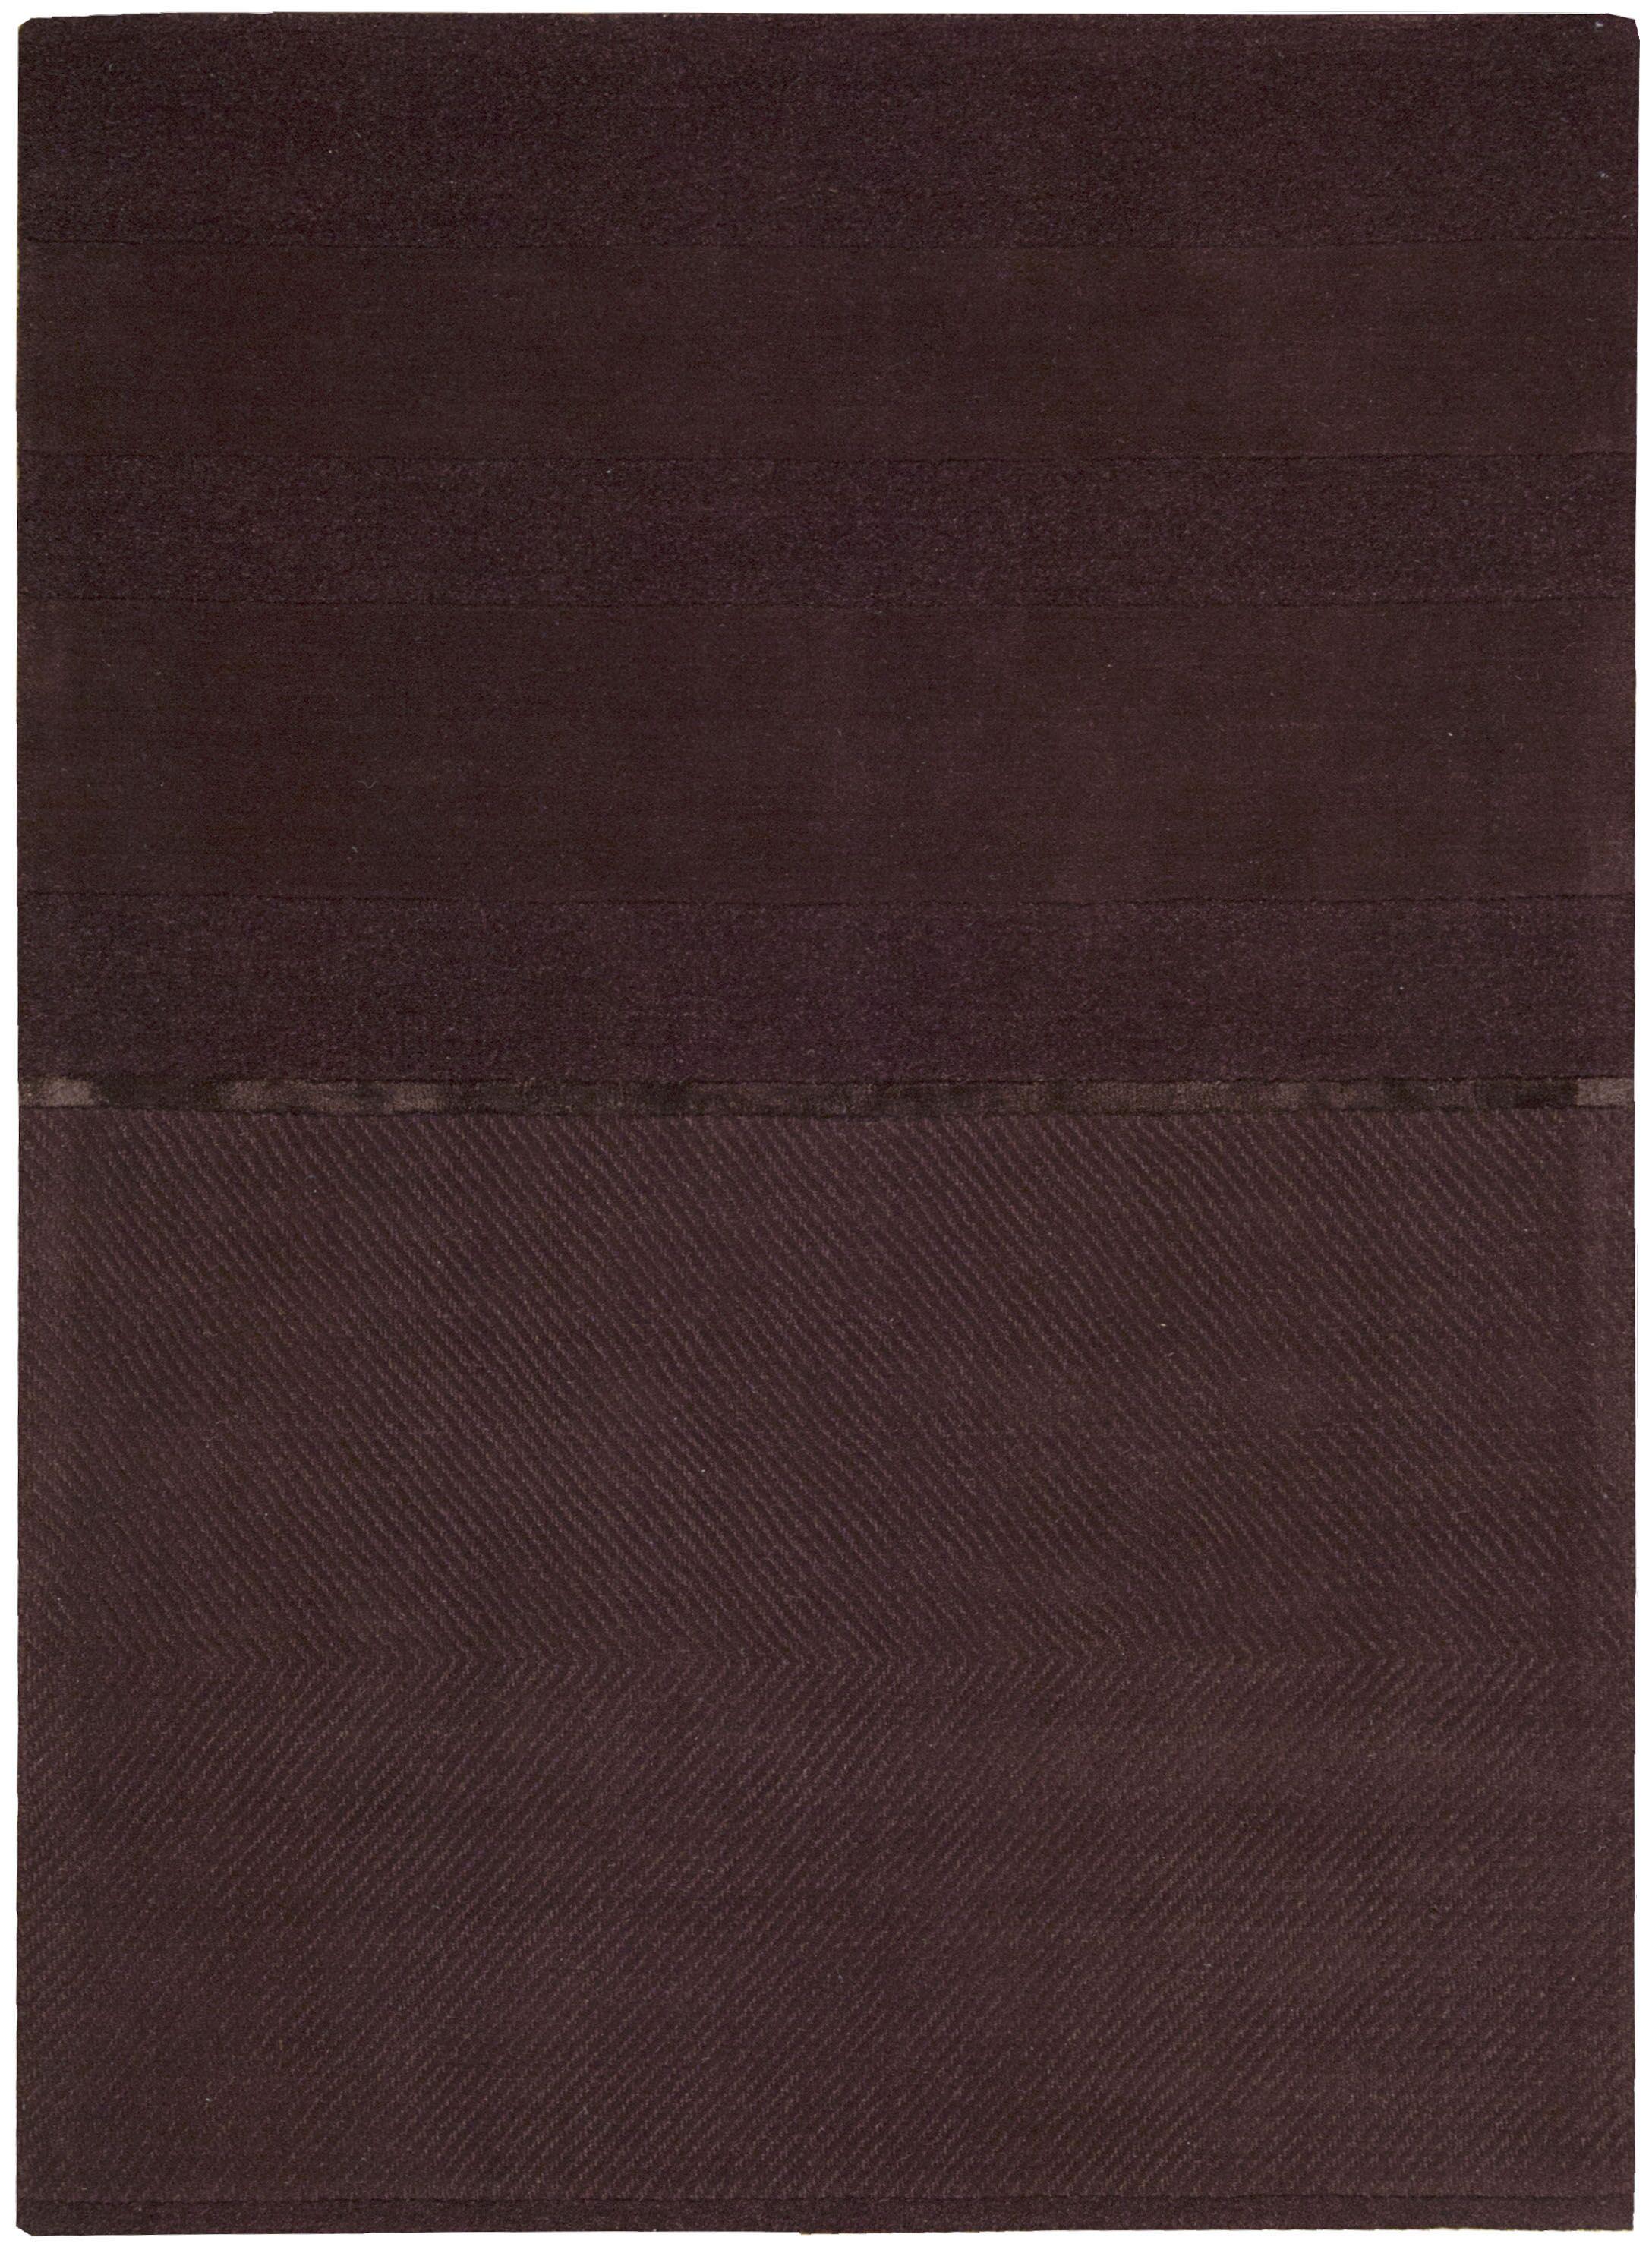 Vale Hand-Woven Portland Burgundy Area Rug Rug Size: Rectangle 4' x 6'